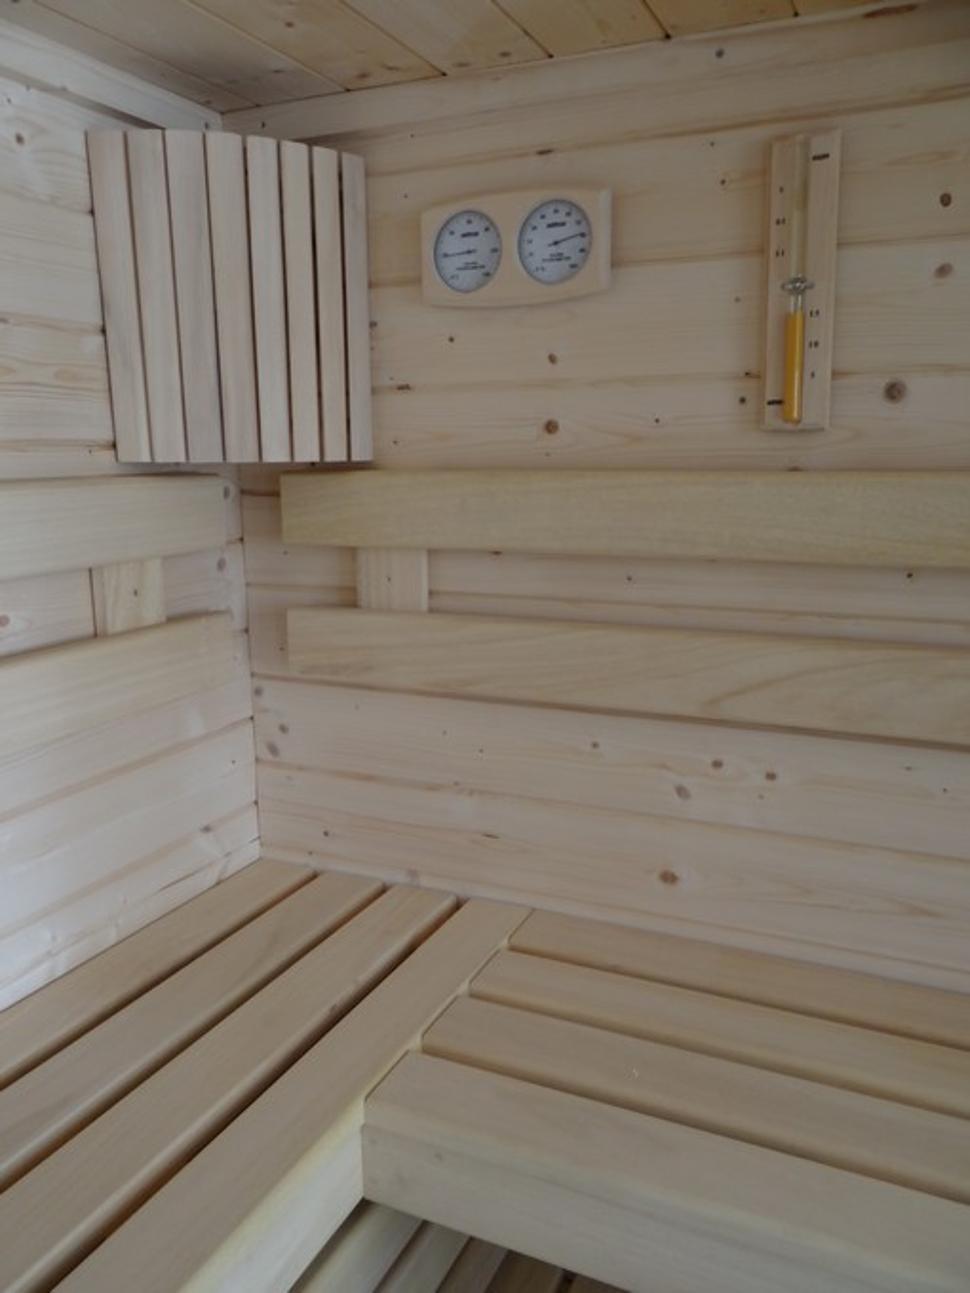 Puits-charmant-schaltin-sauna